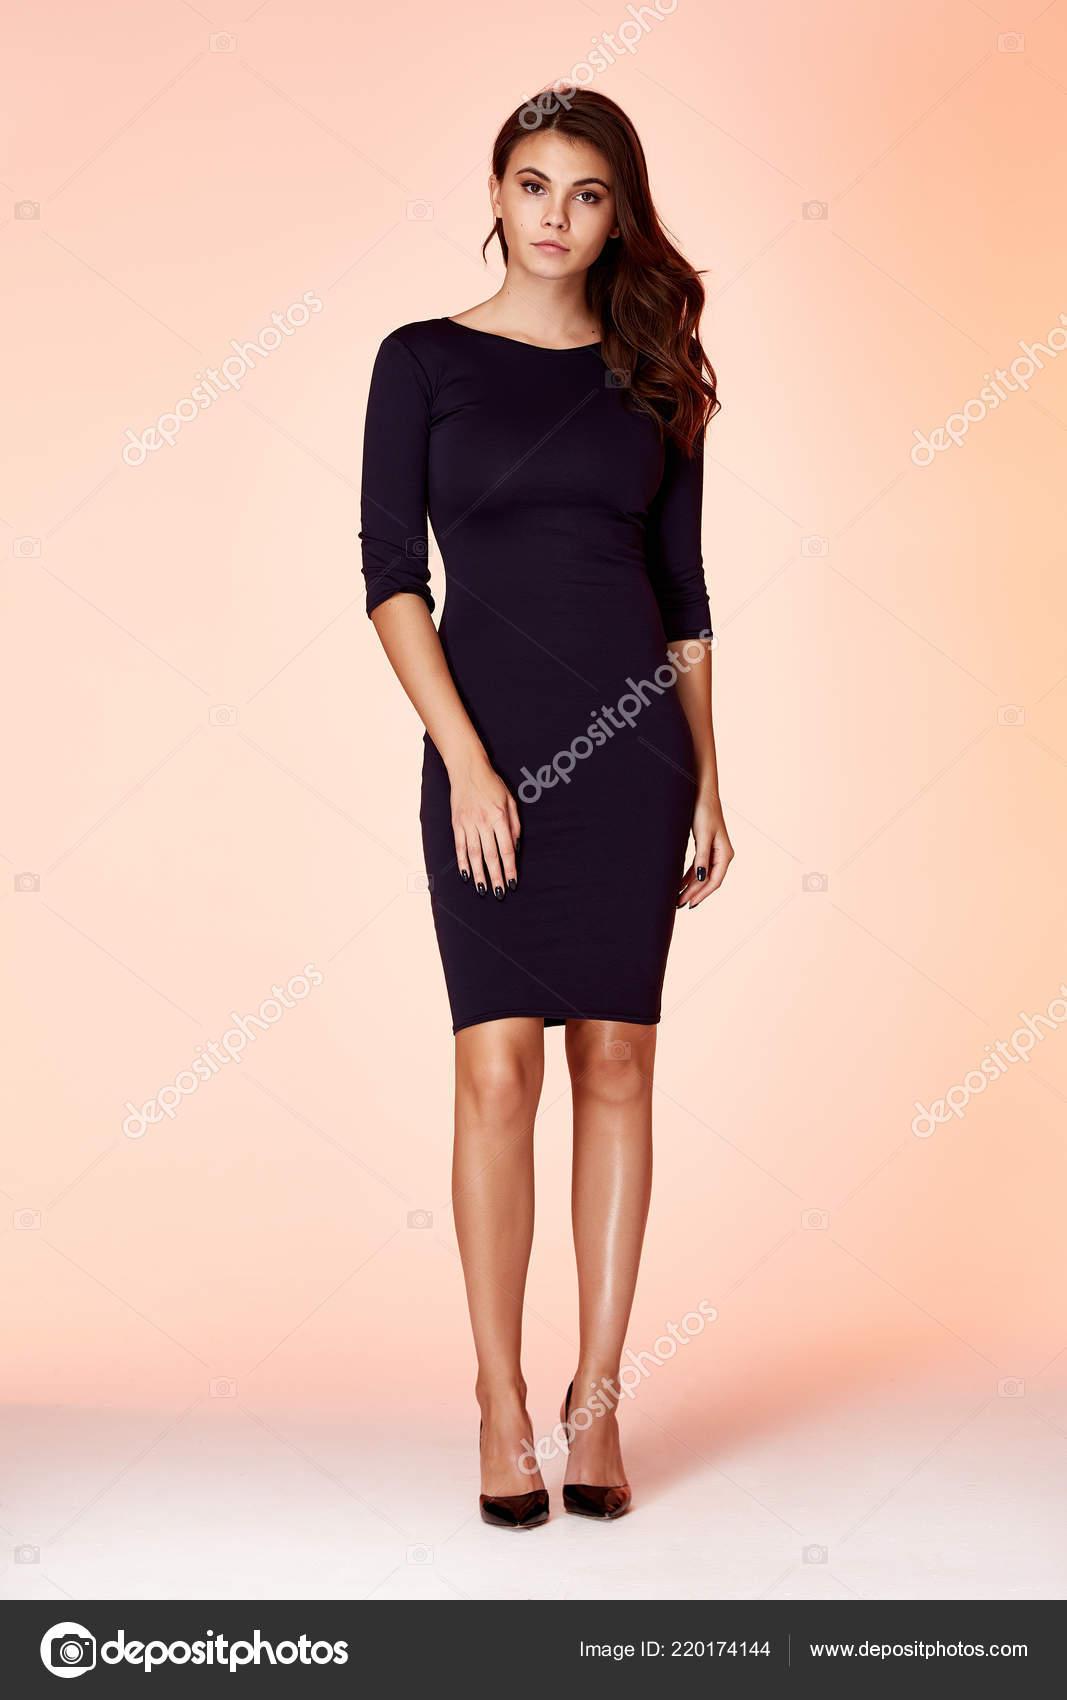 Desgaste Modelo Mujer Belleza Elegante Diseño Tendencia Ropa